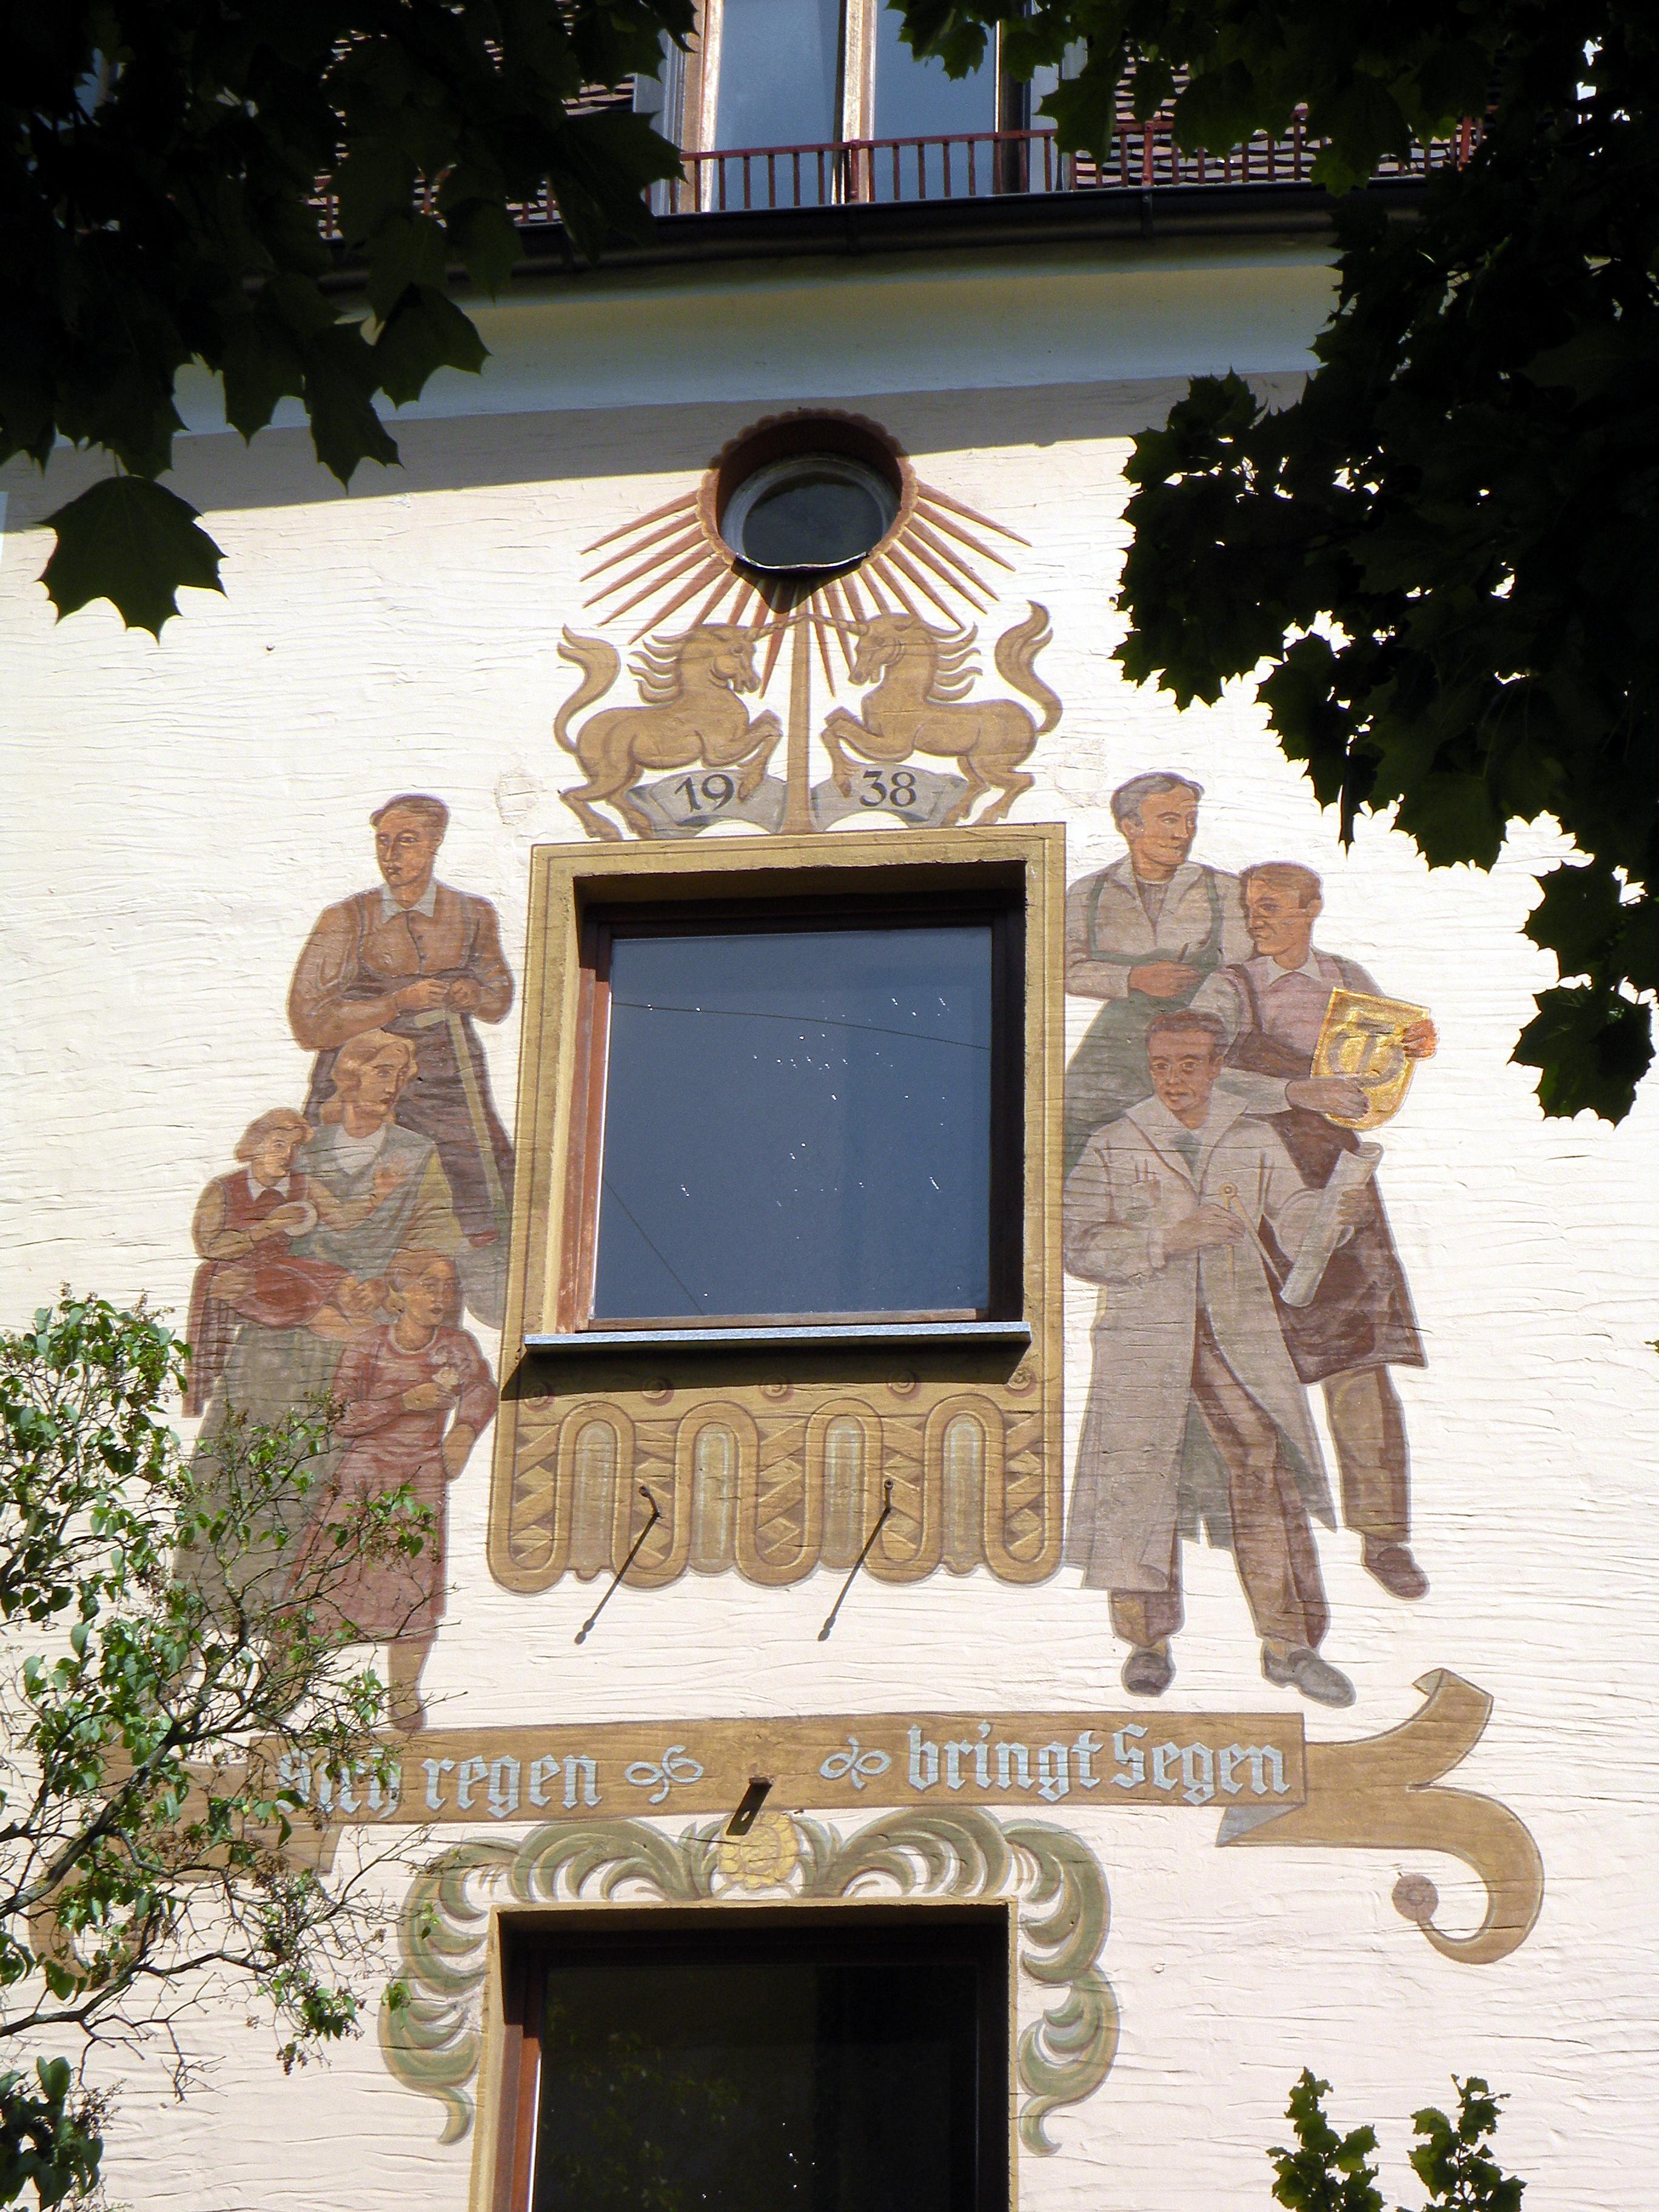 Visual propaganda in Germany, 1938 (Nuremberg, mural). Photos of 2010.